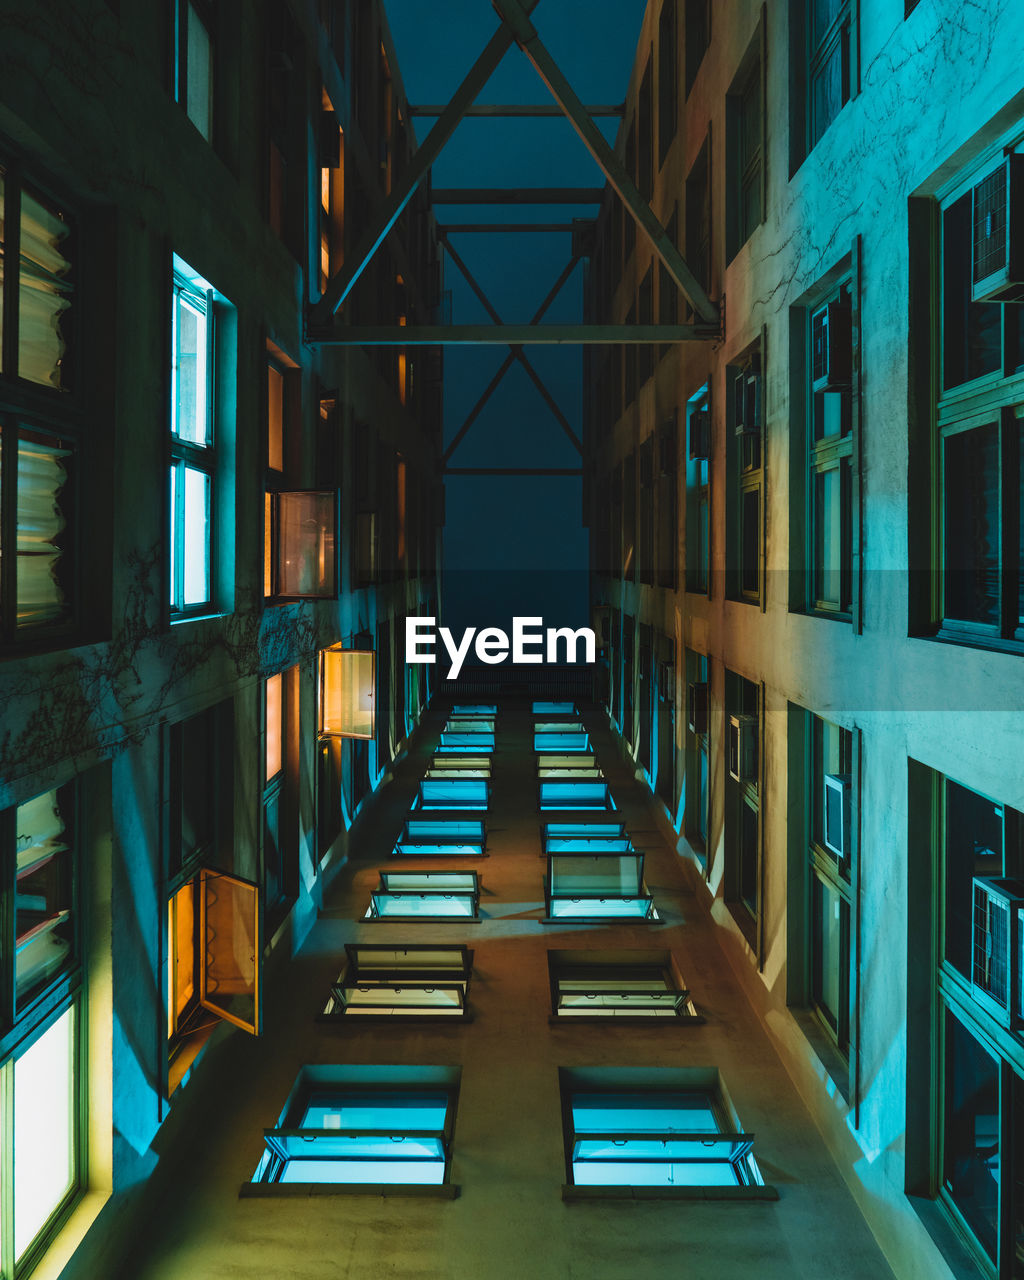 Directly below shot of illuminated building